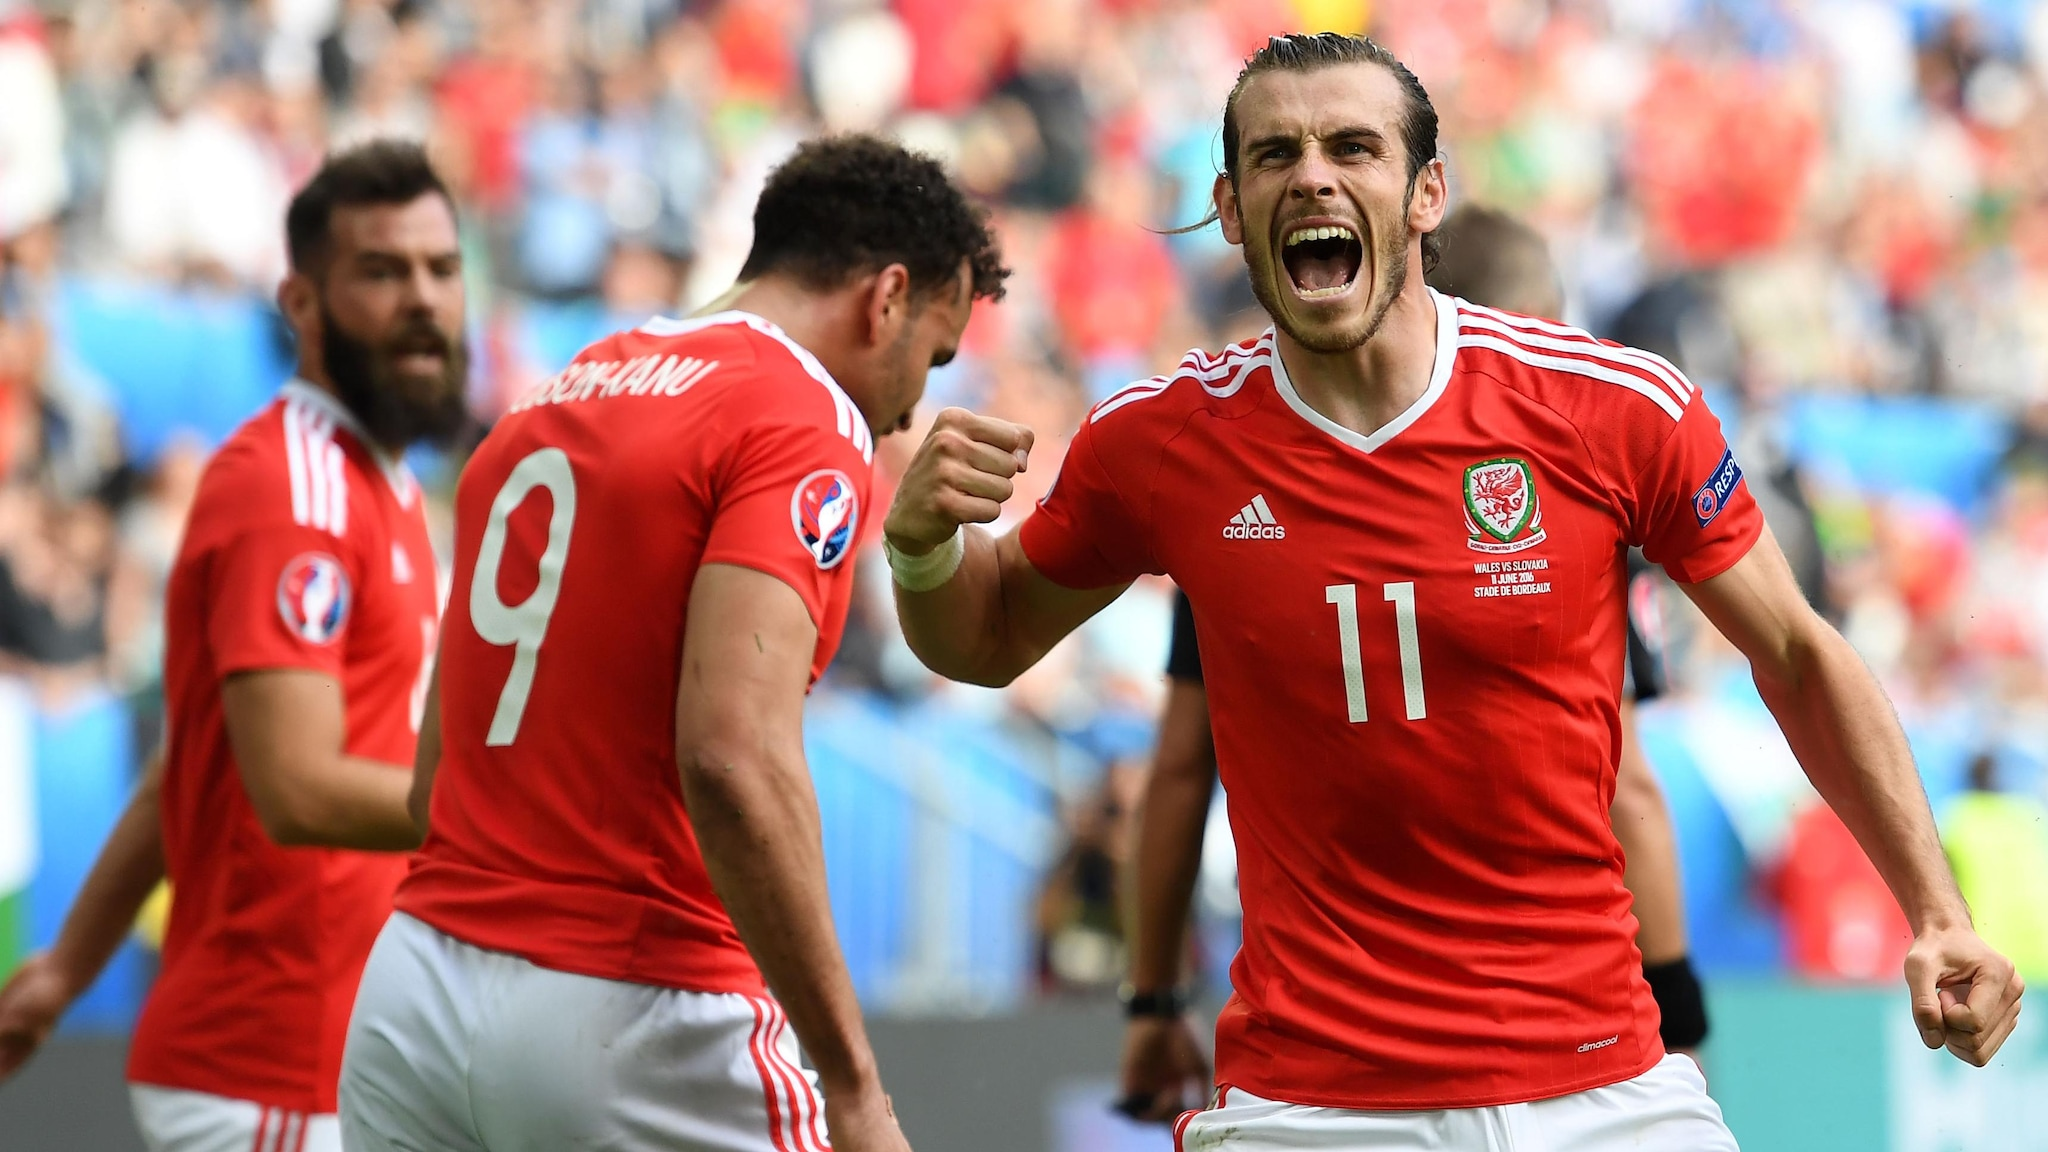 QUIZ: UEFA EURO 2016